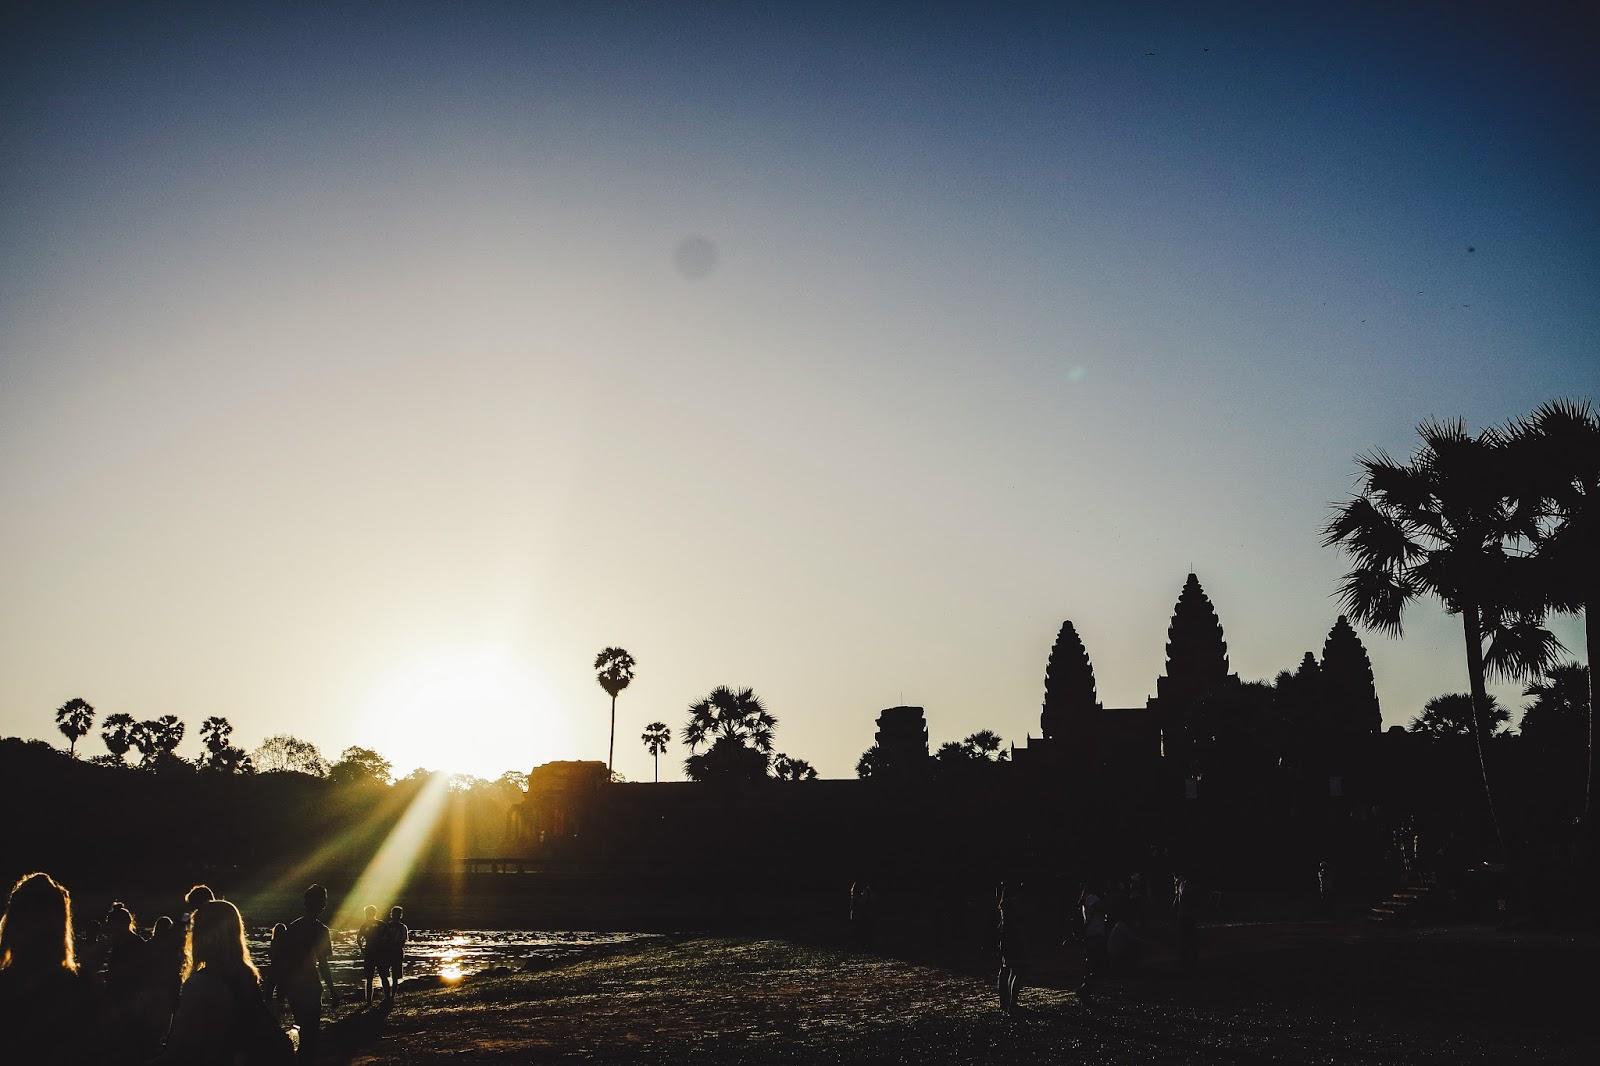 angkor-wat-sunrise-2